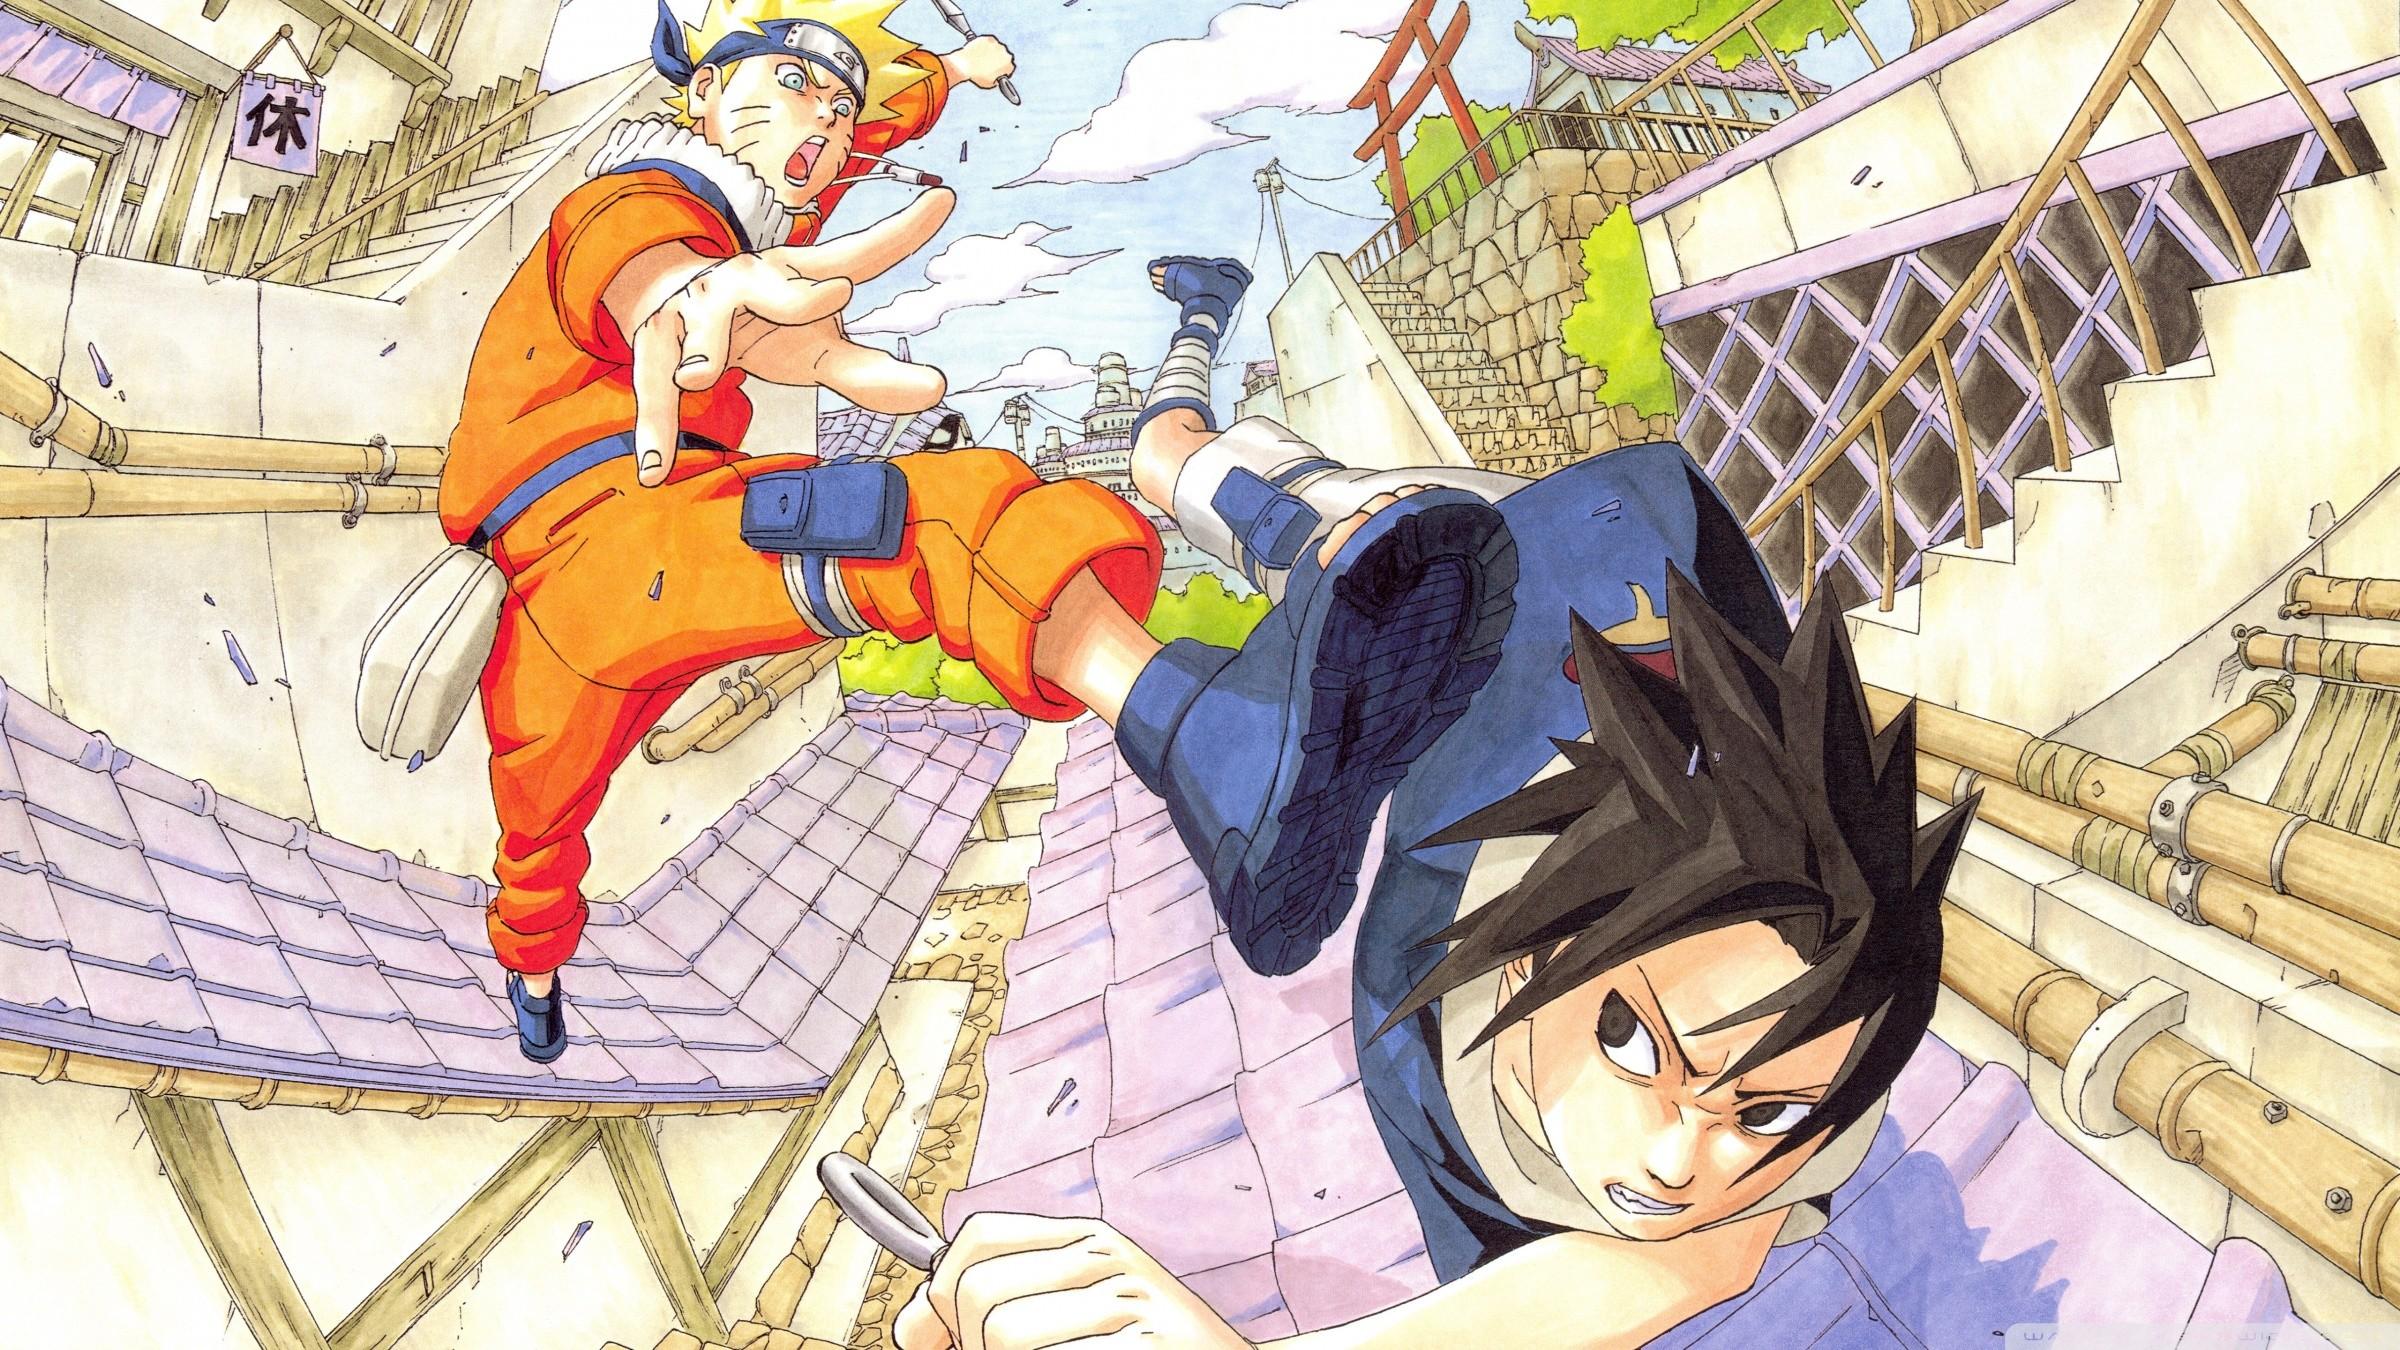 Naruto vs Sasuke | Super HD HD desktop wallpaper Widescreen .